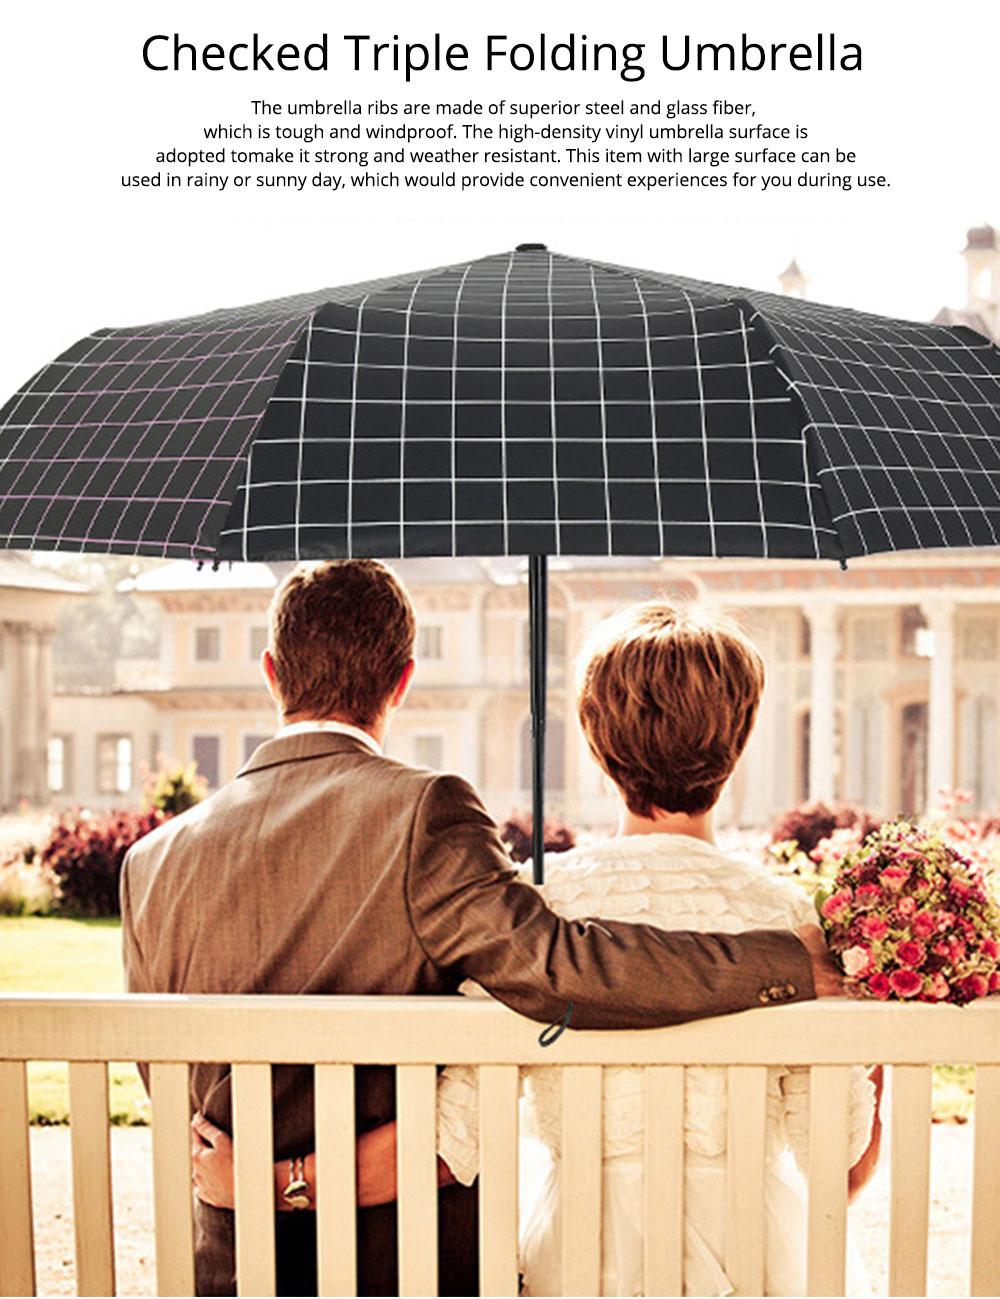 Triple Folding Umbrella in Sunny or Rainy Combination, Sun Protection UV Protection Umbrella with Vinyl Surface 7